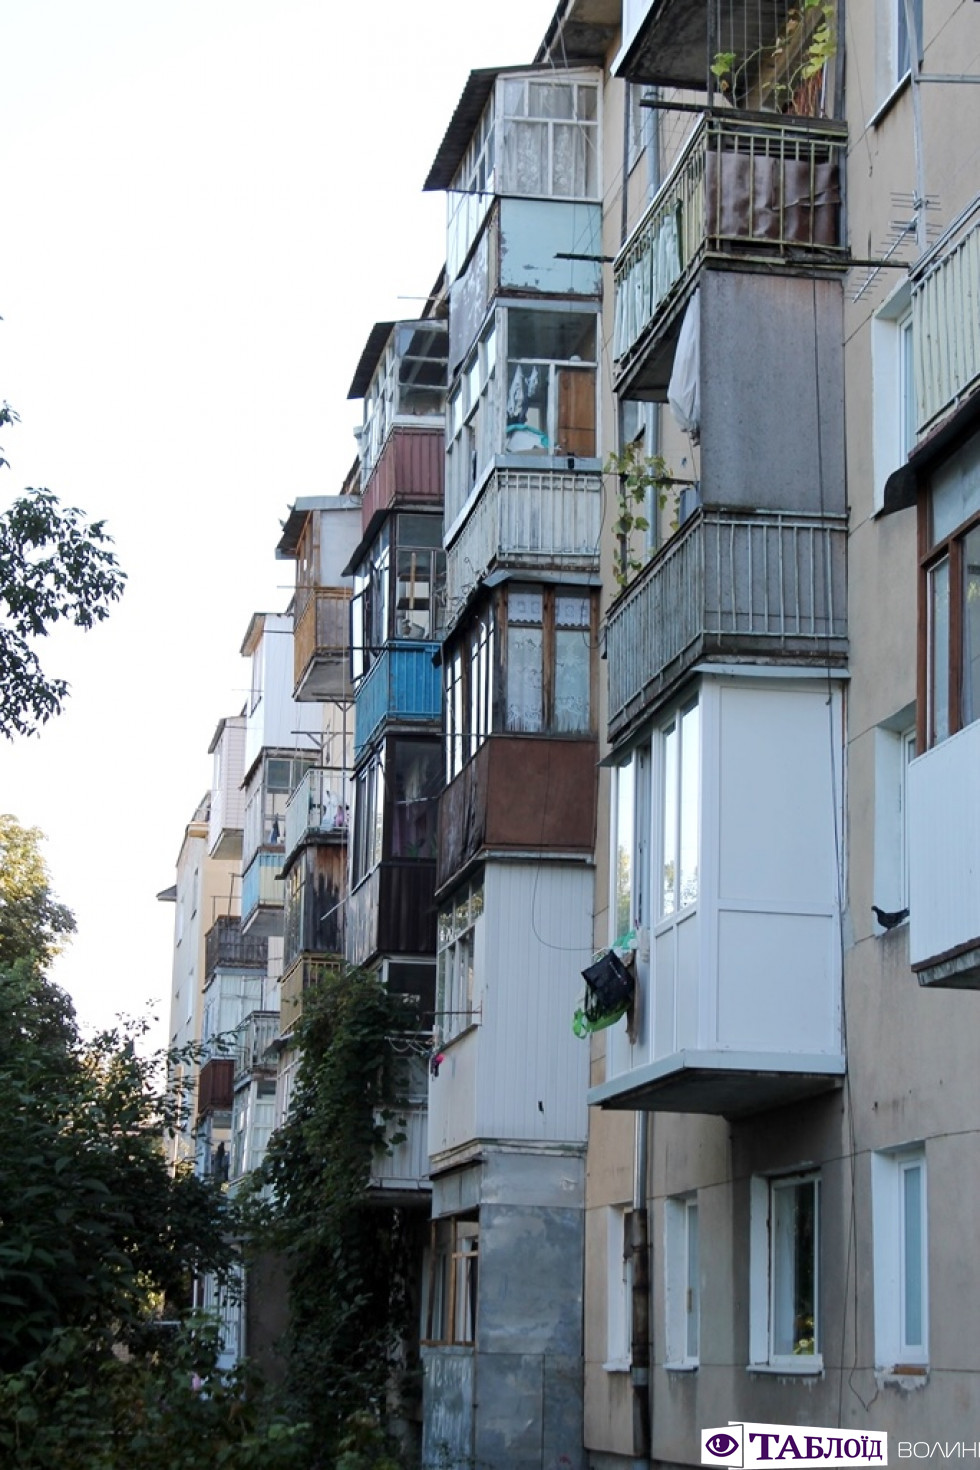 Балкони Луцька: вулиця Гулака-Артемовського. ФОТО